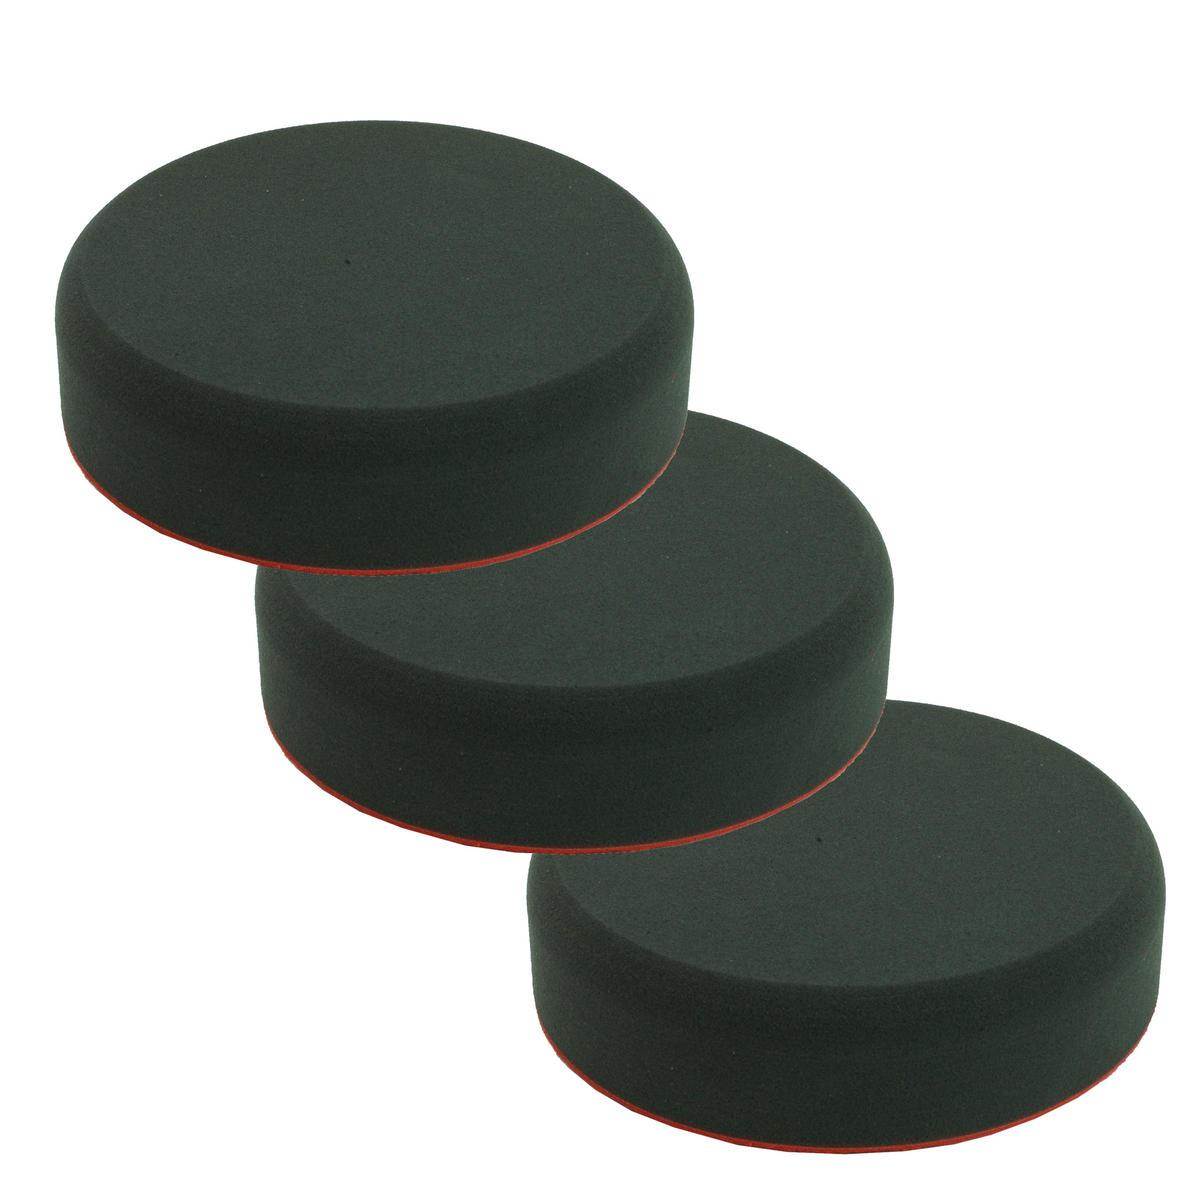 Car Cleaning 200mm Soft Black Velcro Polishing Cutting Detailing Mop Head x 3